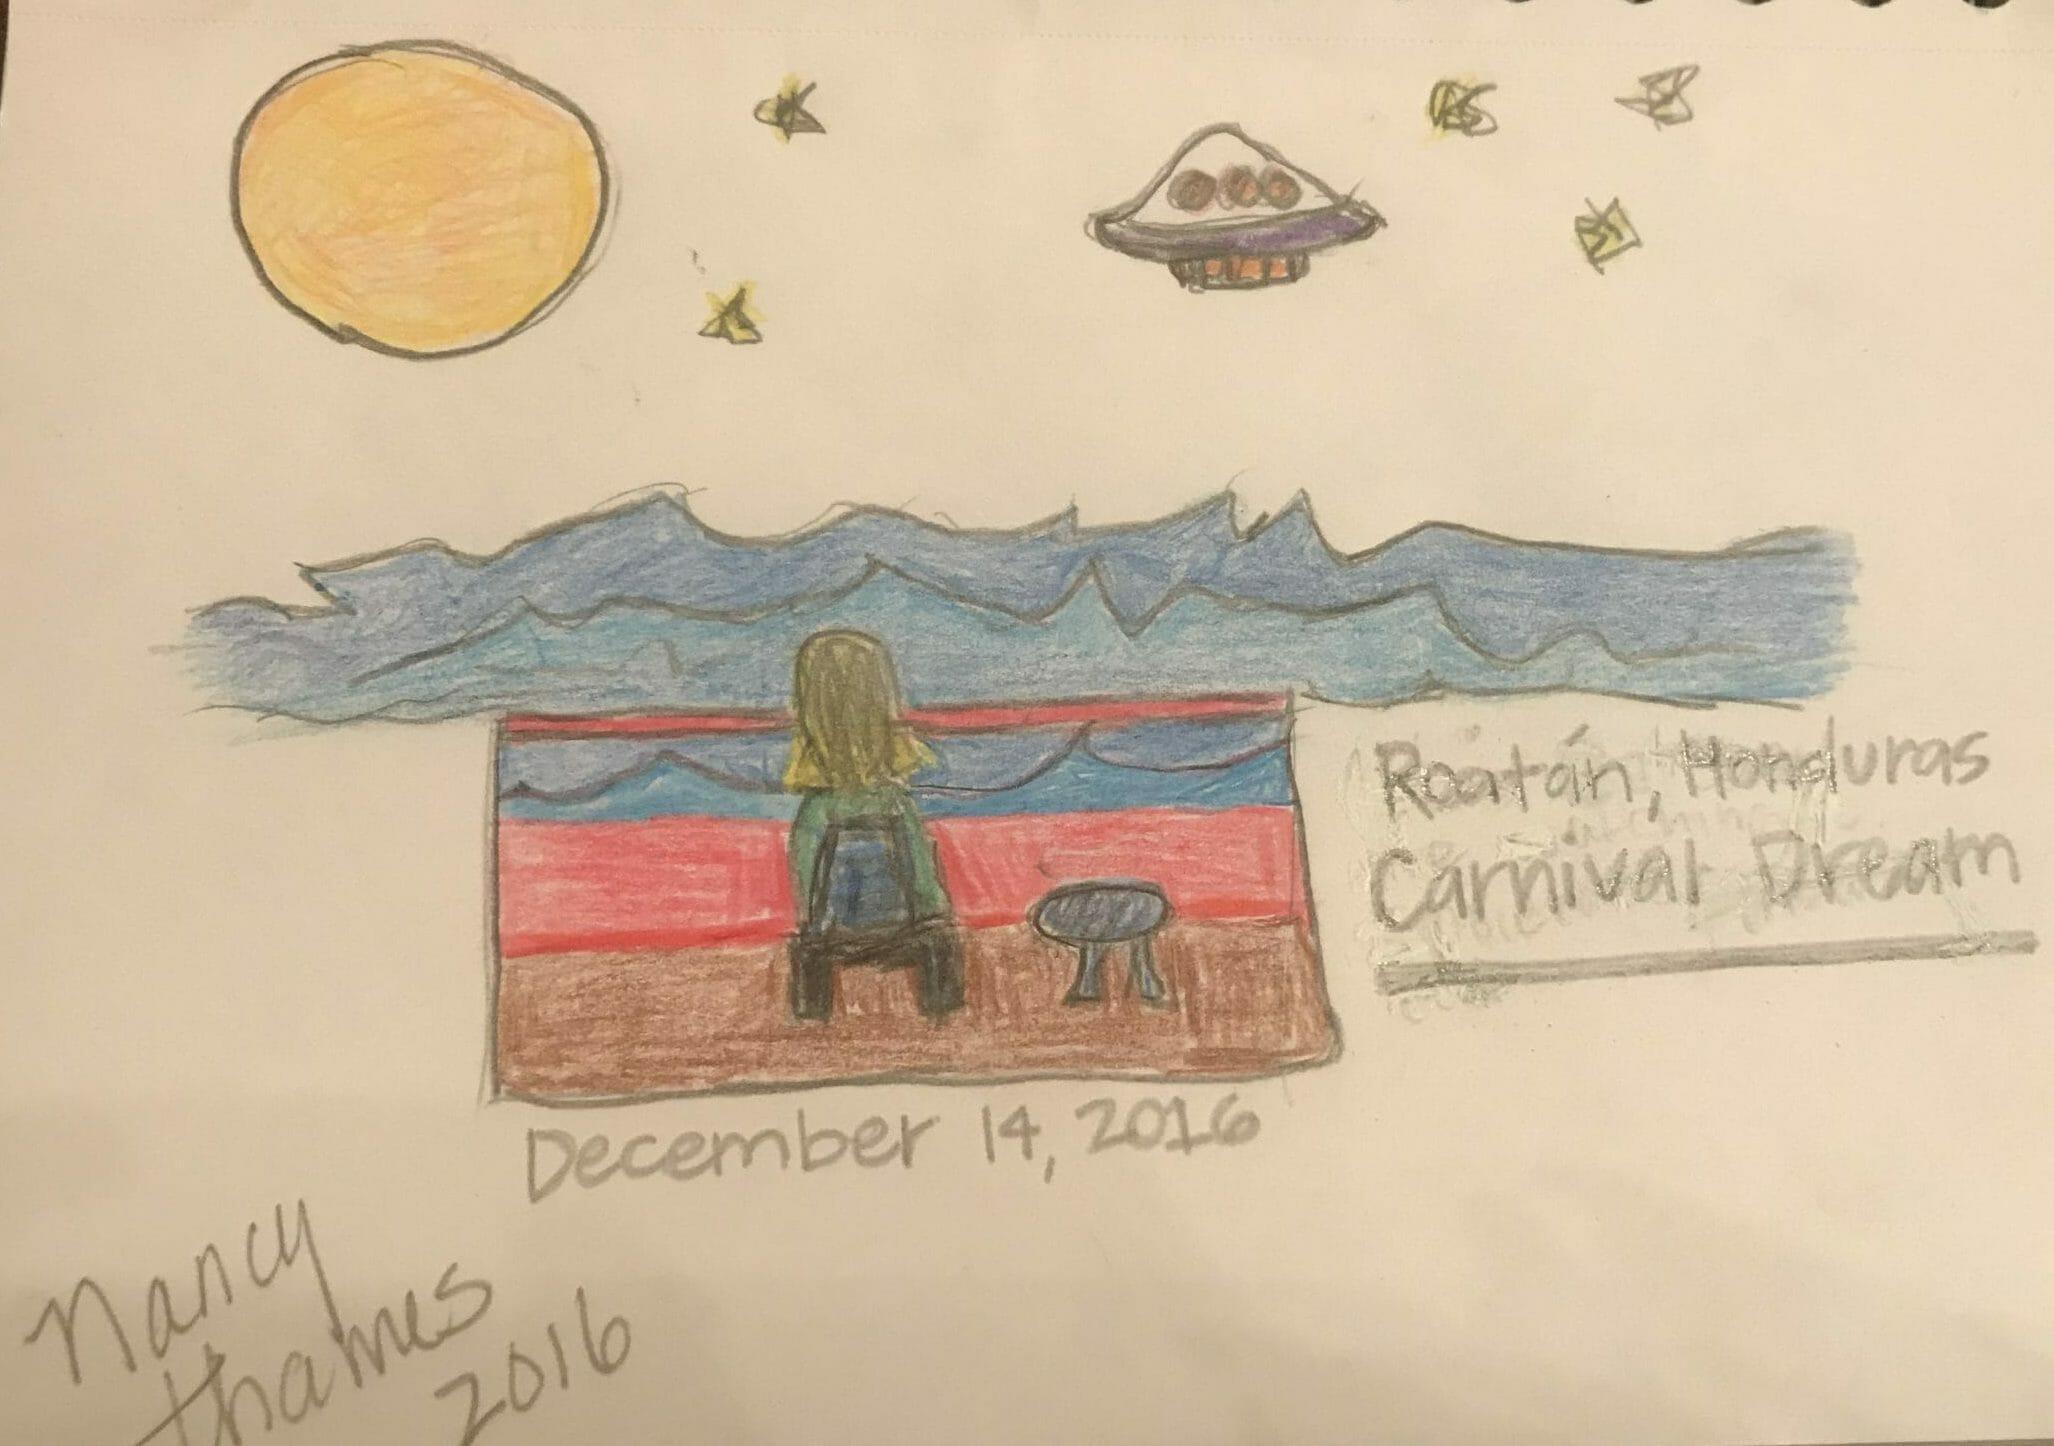 Alien encounter on carnival cruise while near Honduras